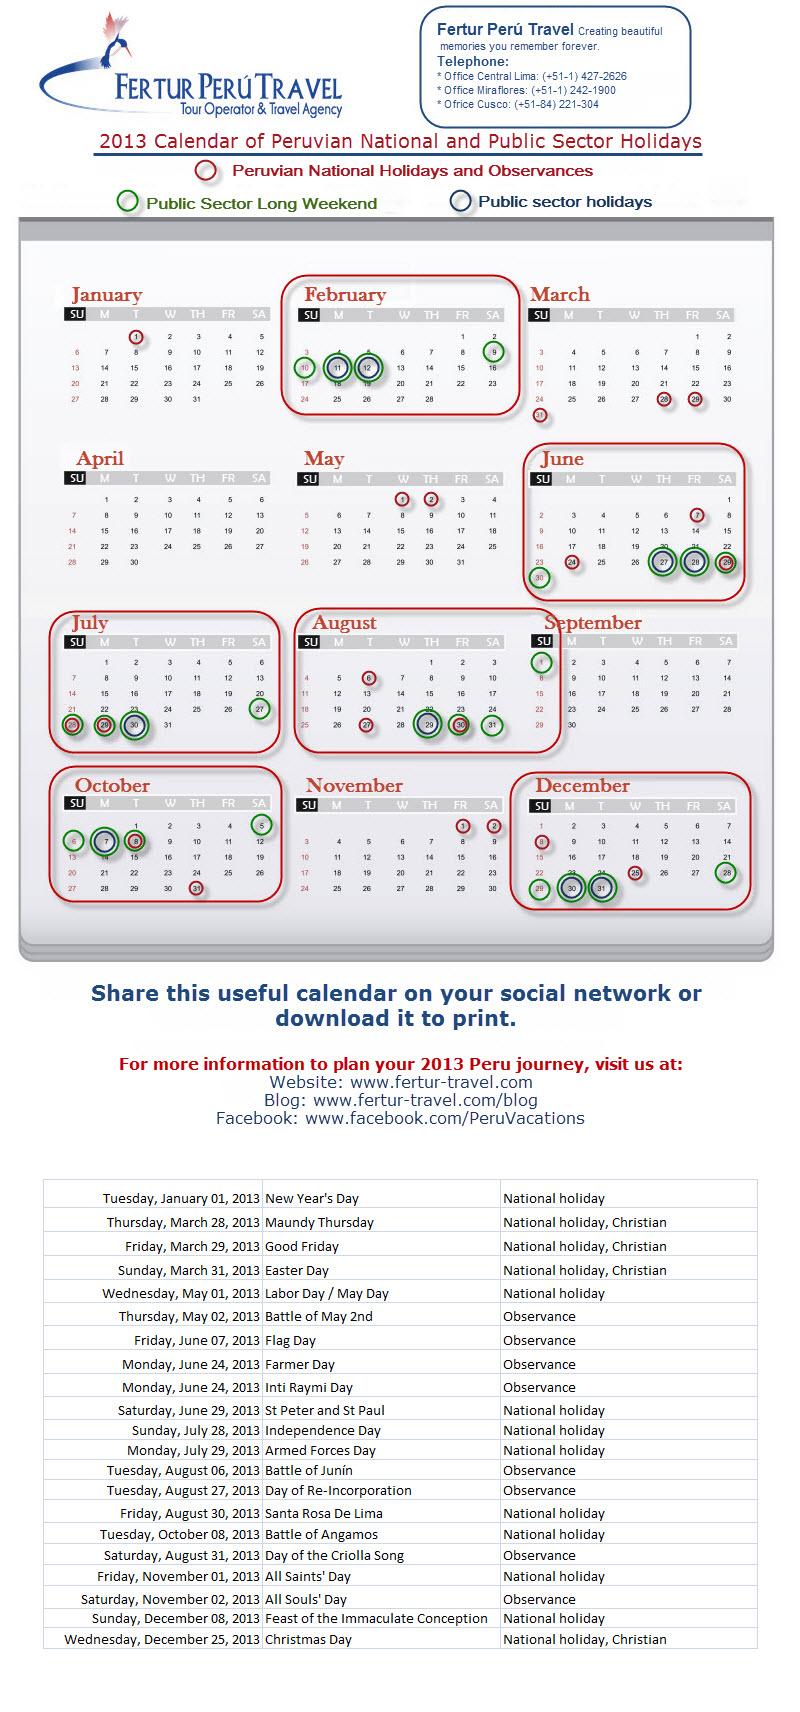 Calendar of 2013 Peru National and Public Sector Holidays